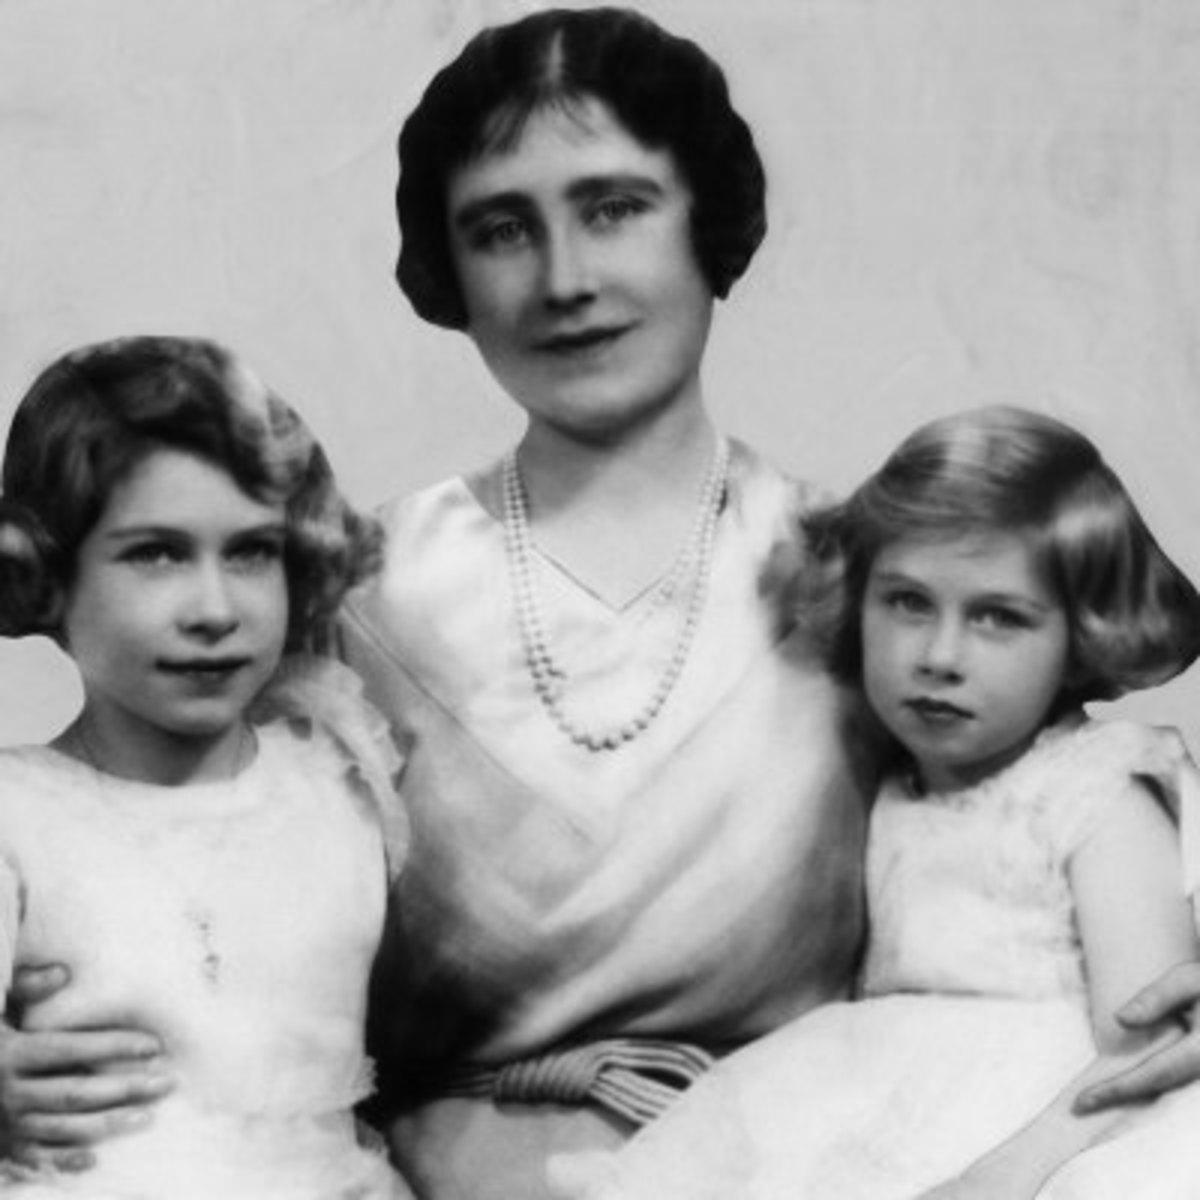 Queen Mother, Princess Elizabeth (future Queen), and Princes Margaret courtesy of allposters.com